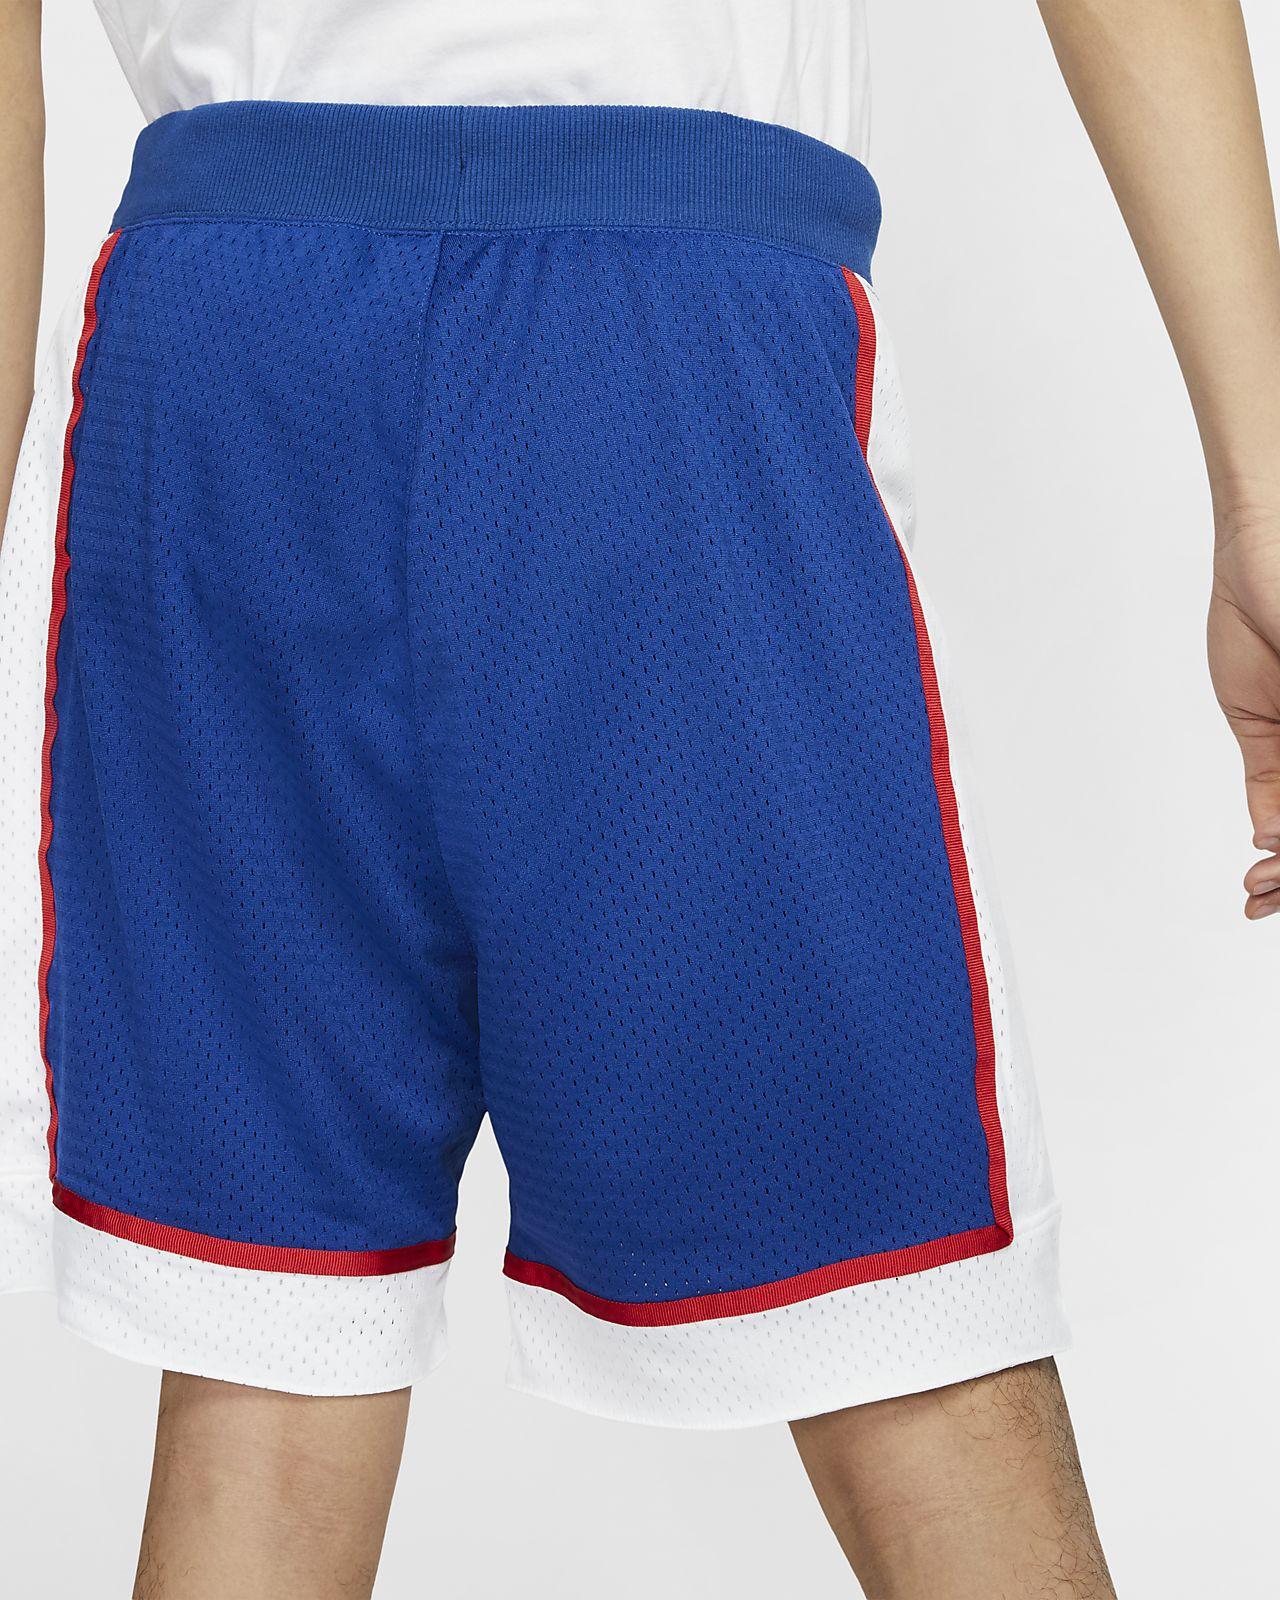 Short Homme Nike Mesh Sportswear Pour En mNPwOv8ny0